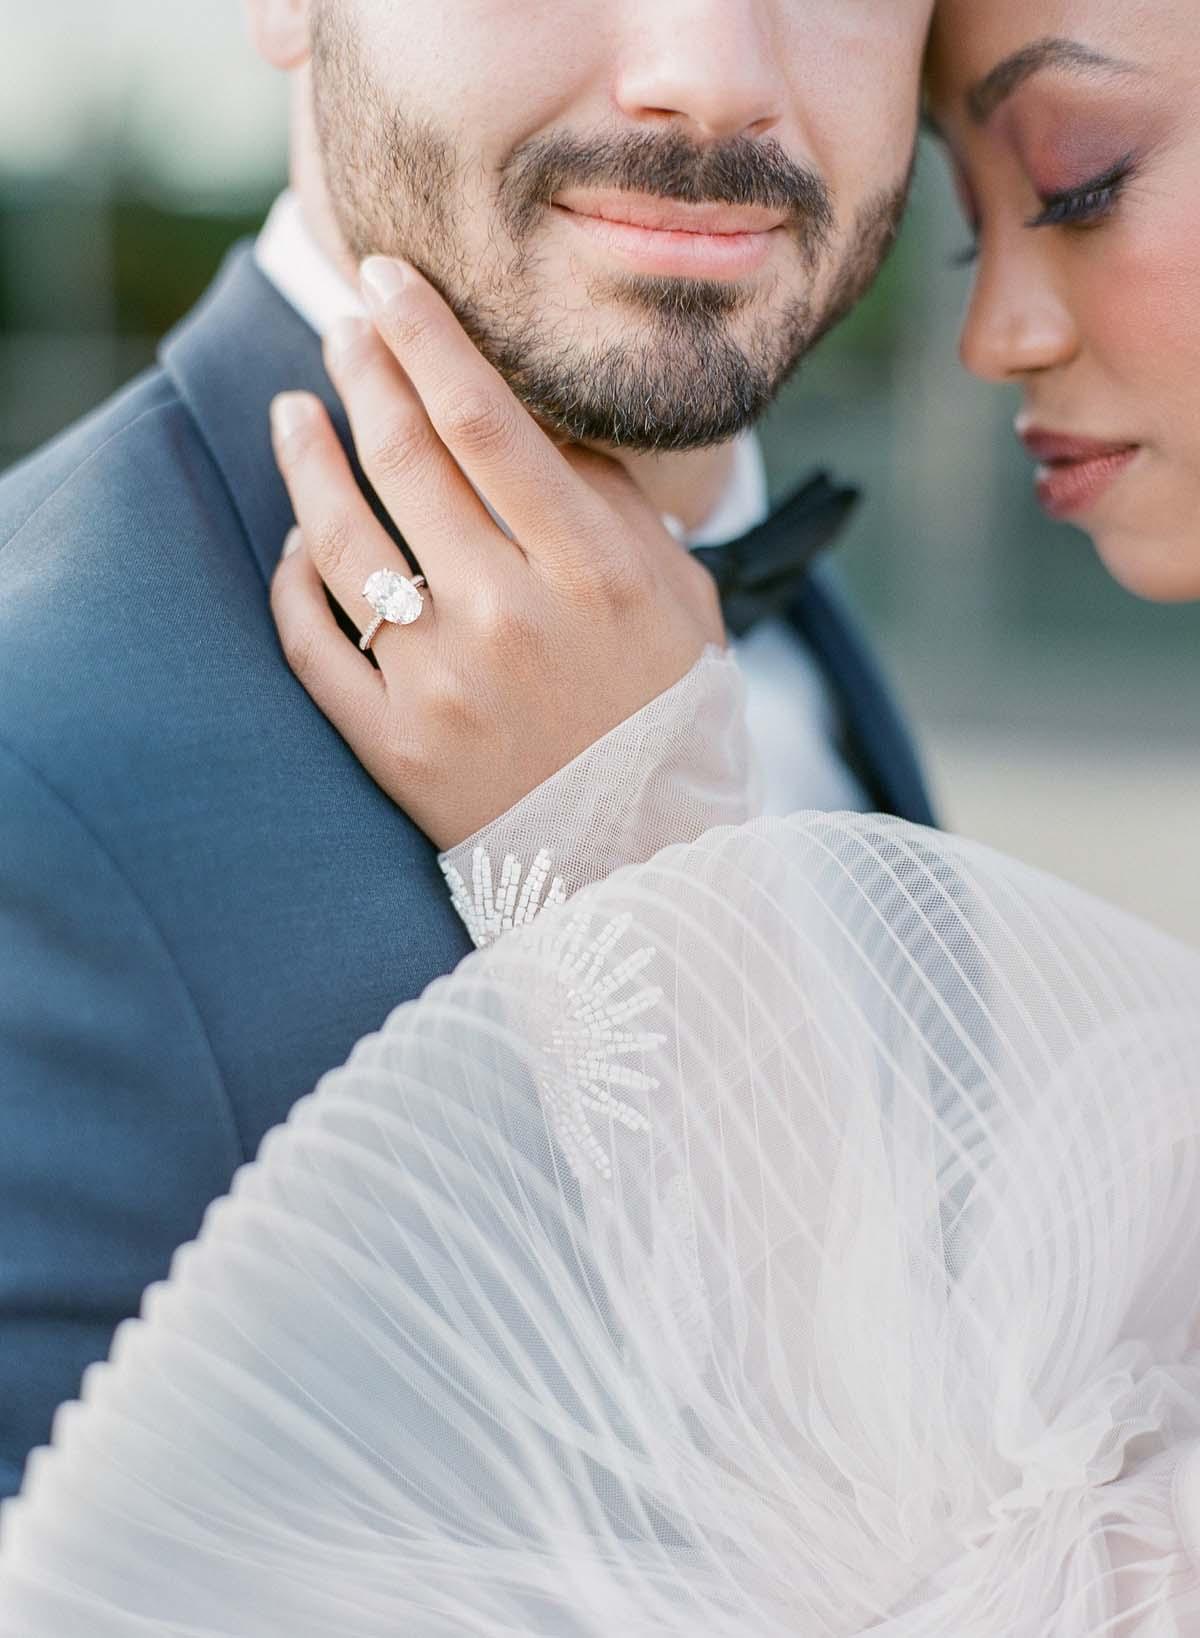 XOXO_BRIDE_Events-Michelle-Beller_Photography_0115